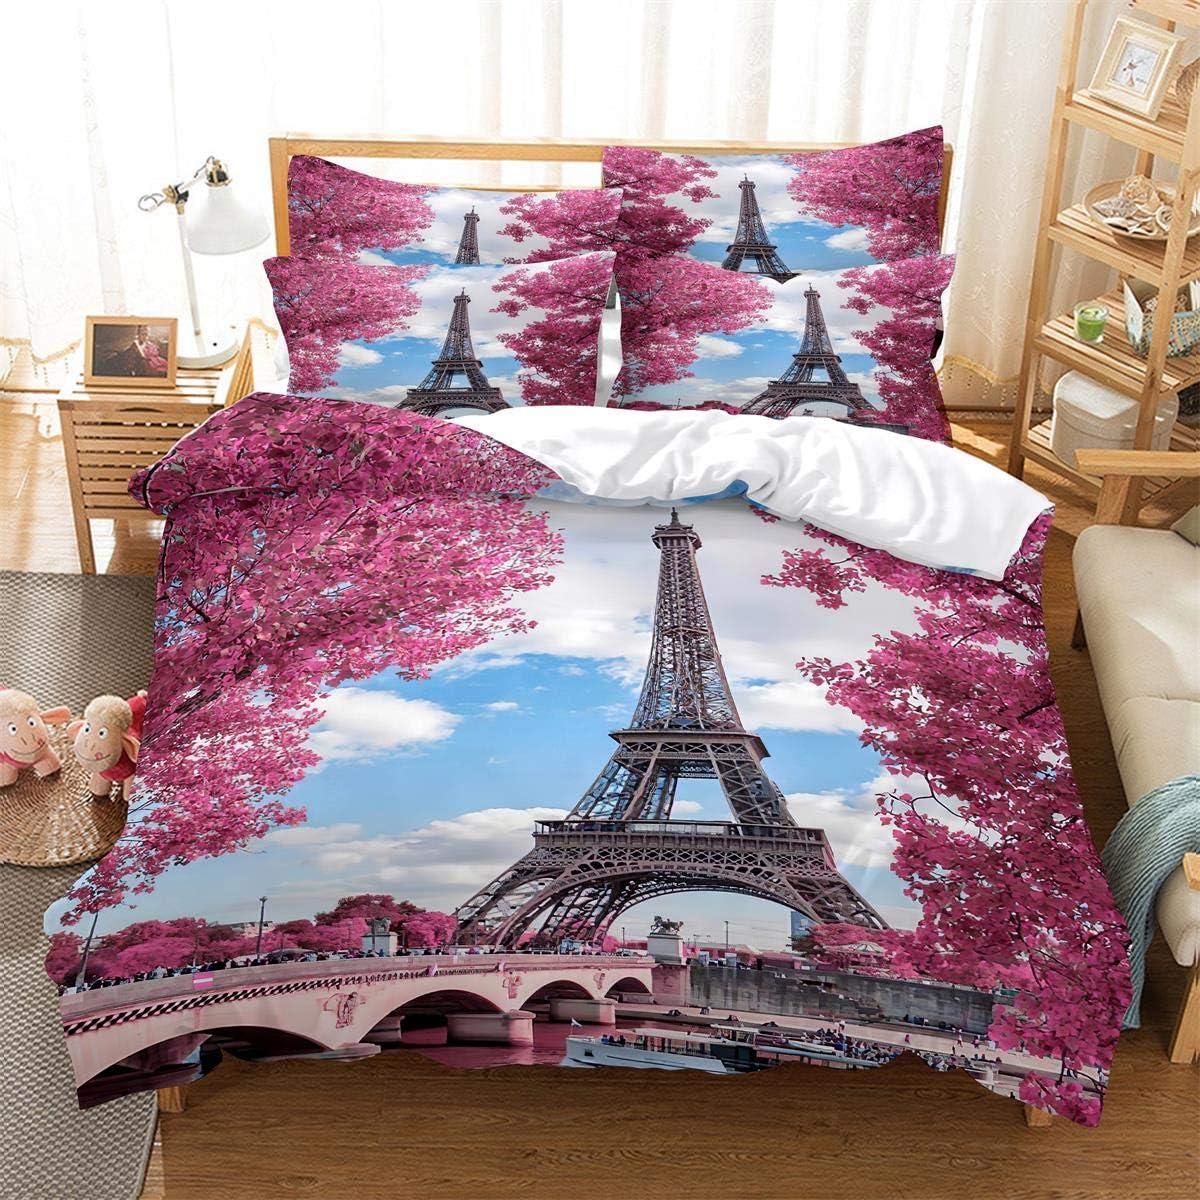 MANXI Large-scale sale Paris Ranking TOP14 City Comforter Cover Print Set Eiffel Tower Bedding